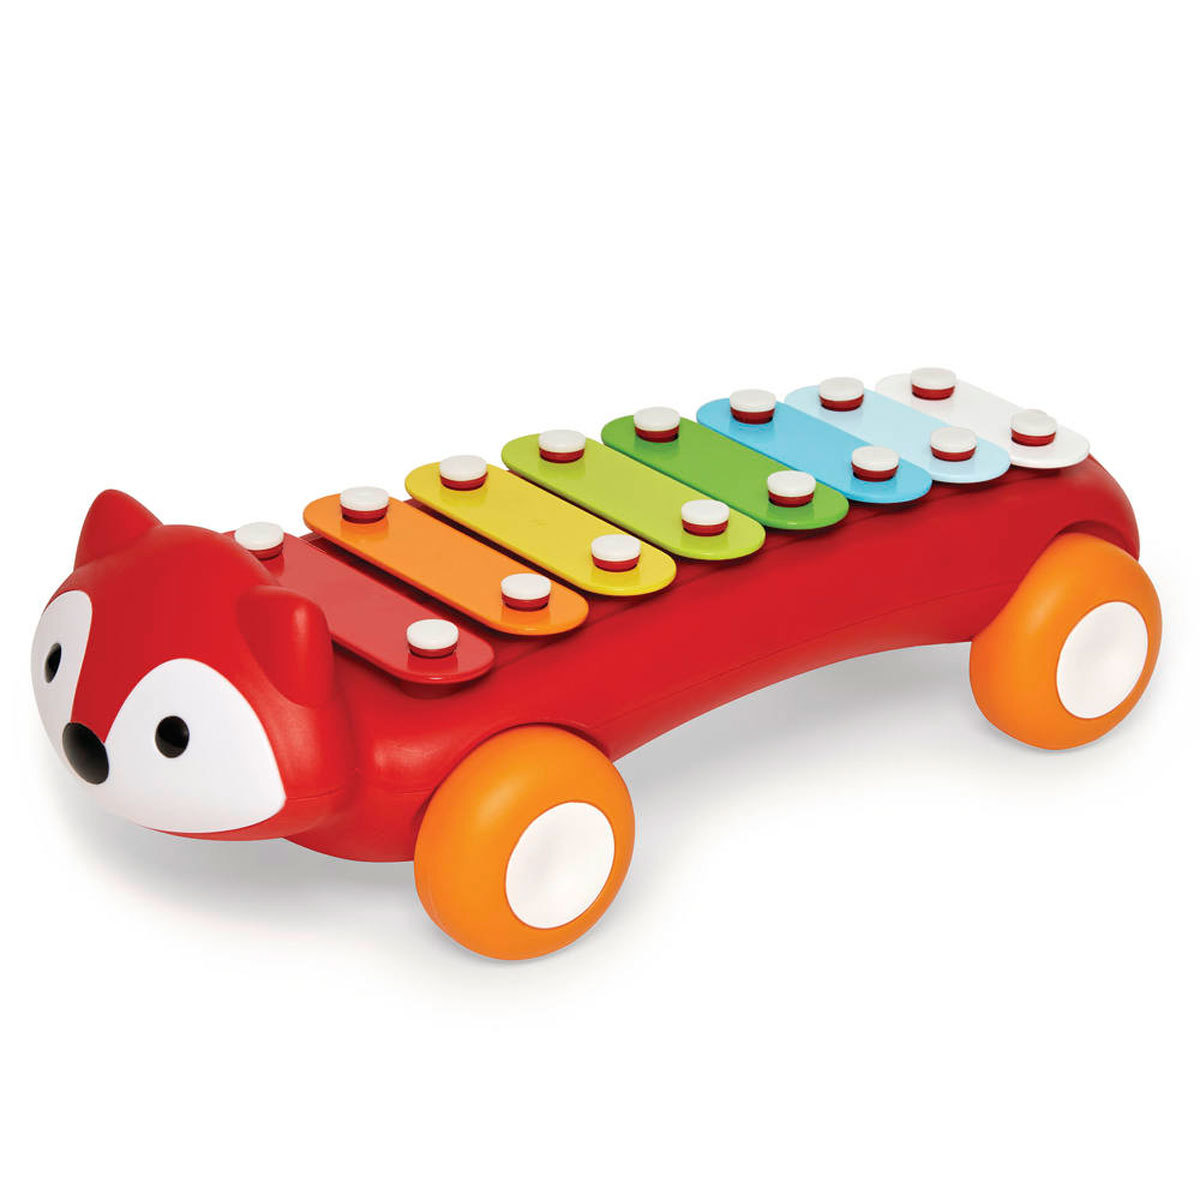 Mes premiers jouets Explore & More - Xylophone Renard Explore & More - Xylophone Renard